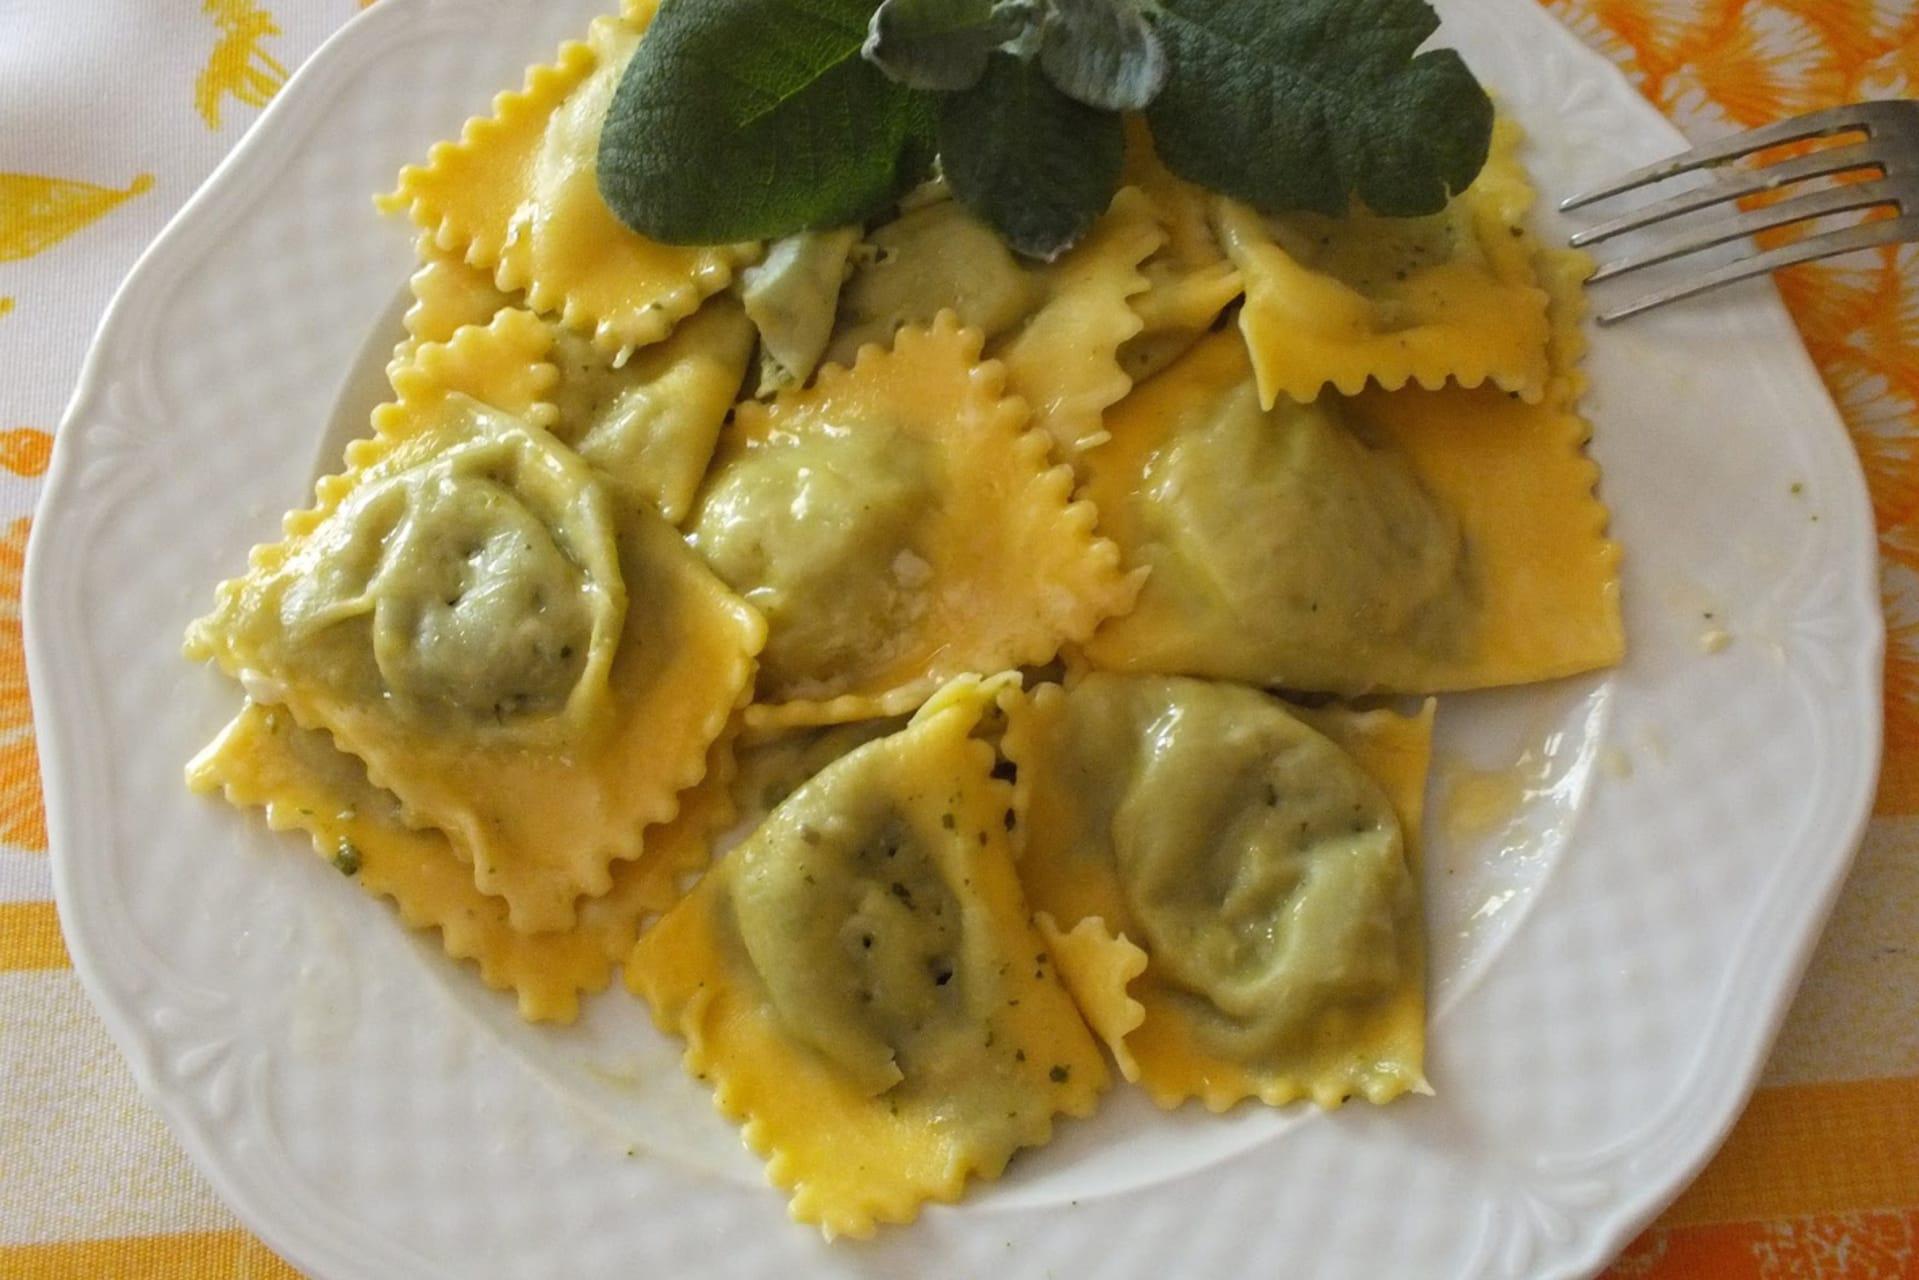 Ravenna - Tortelli Verdi di Parma: from Emilia with Love